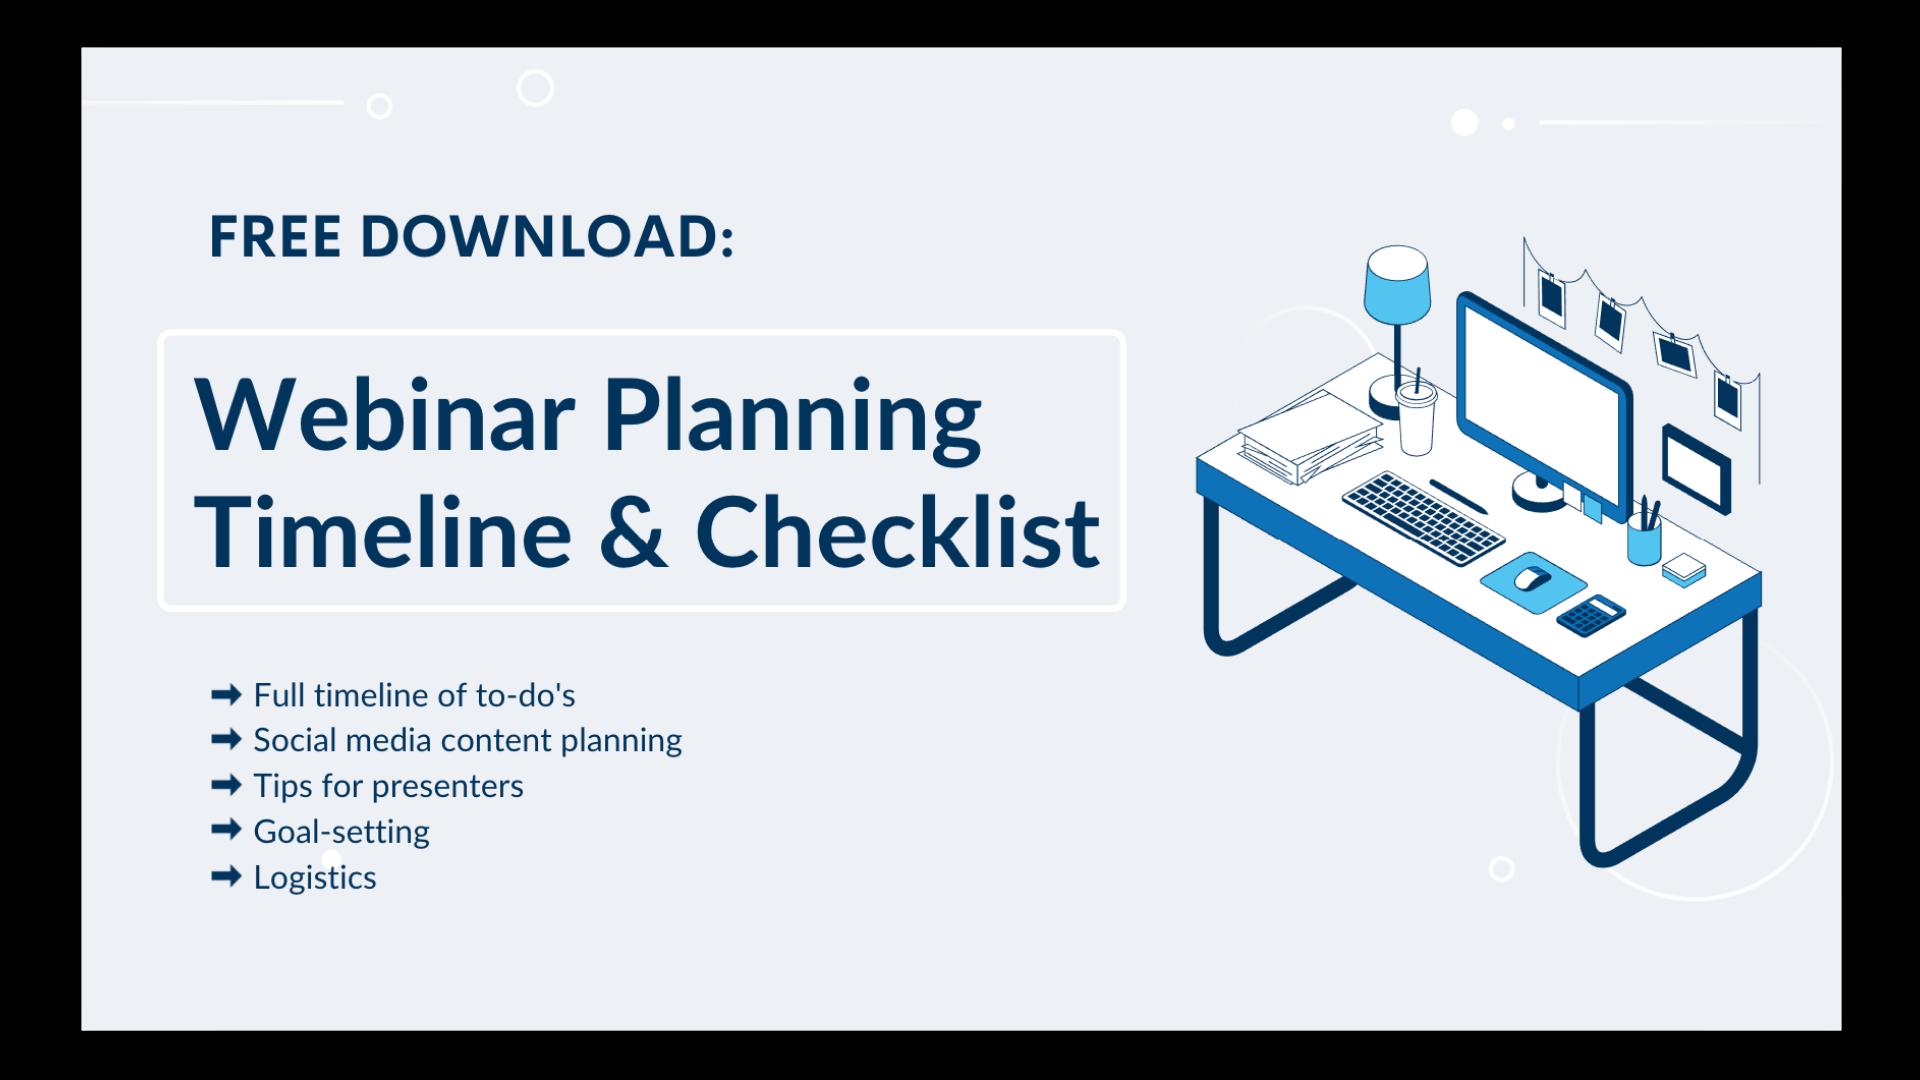 Webinar Planning Timeline & Checklist